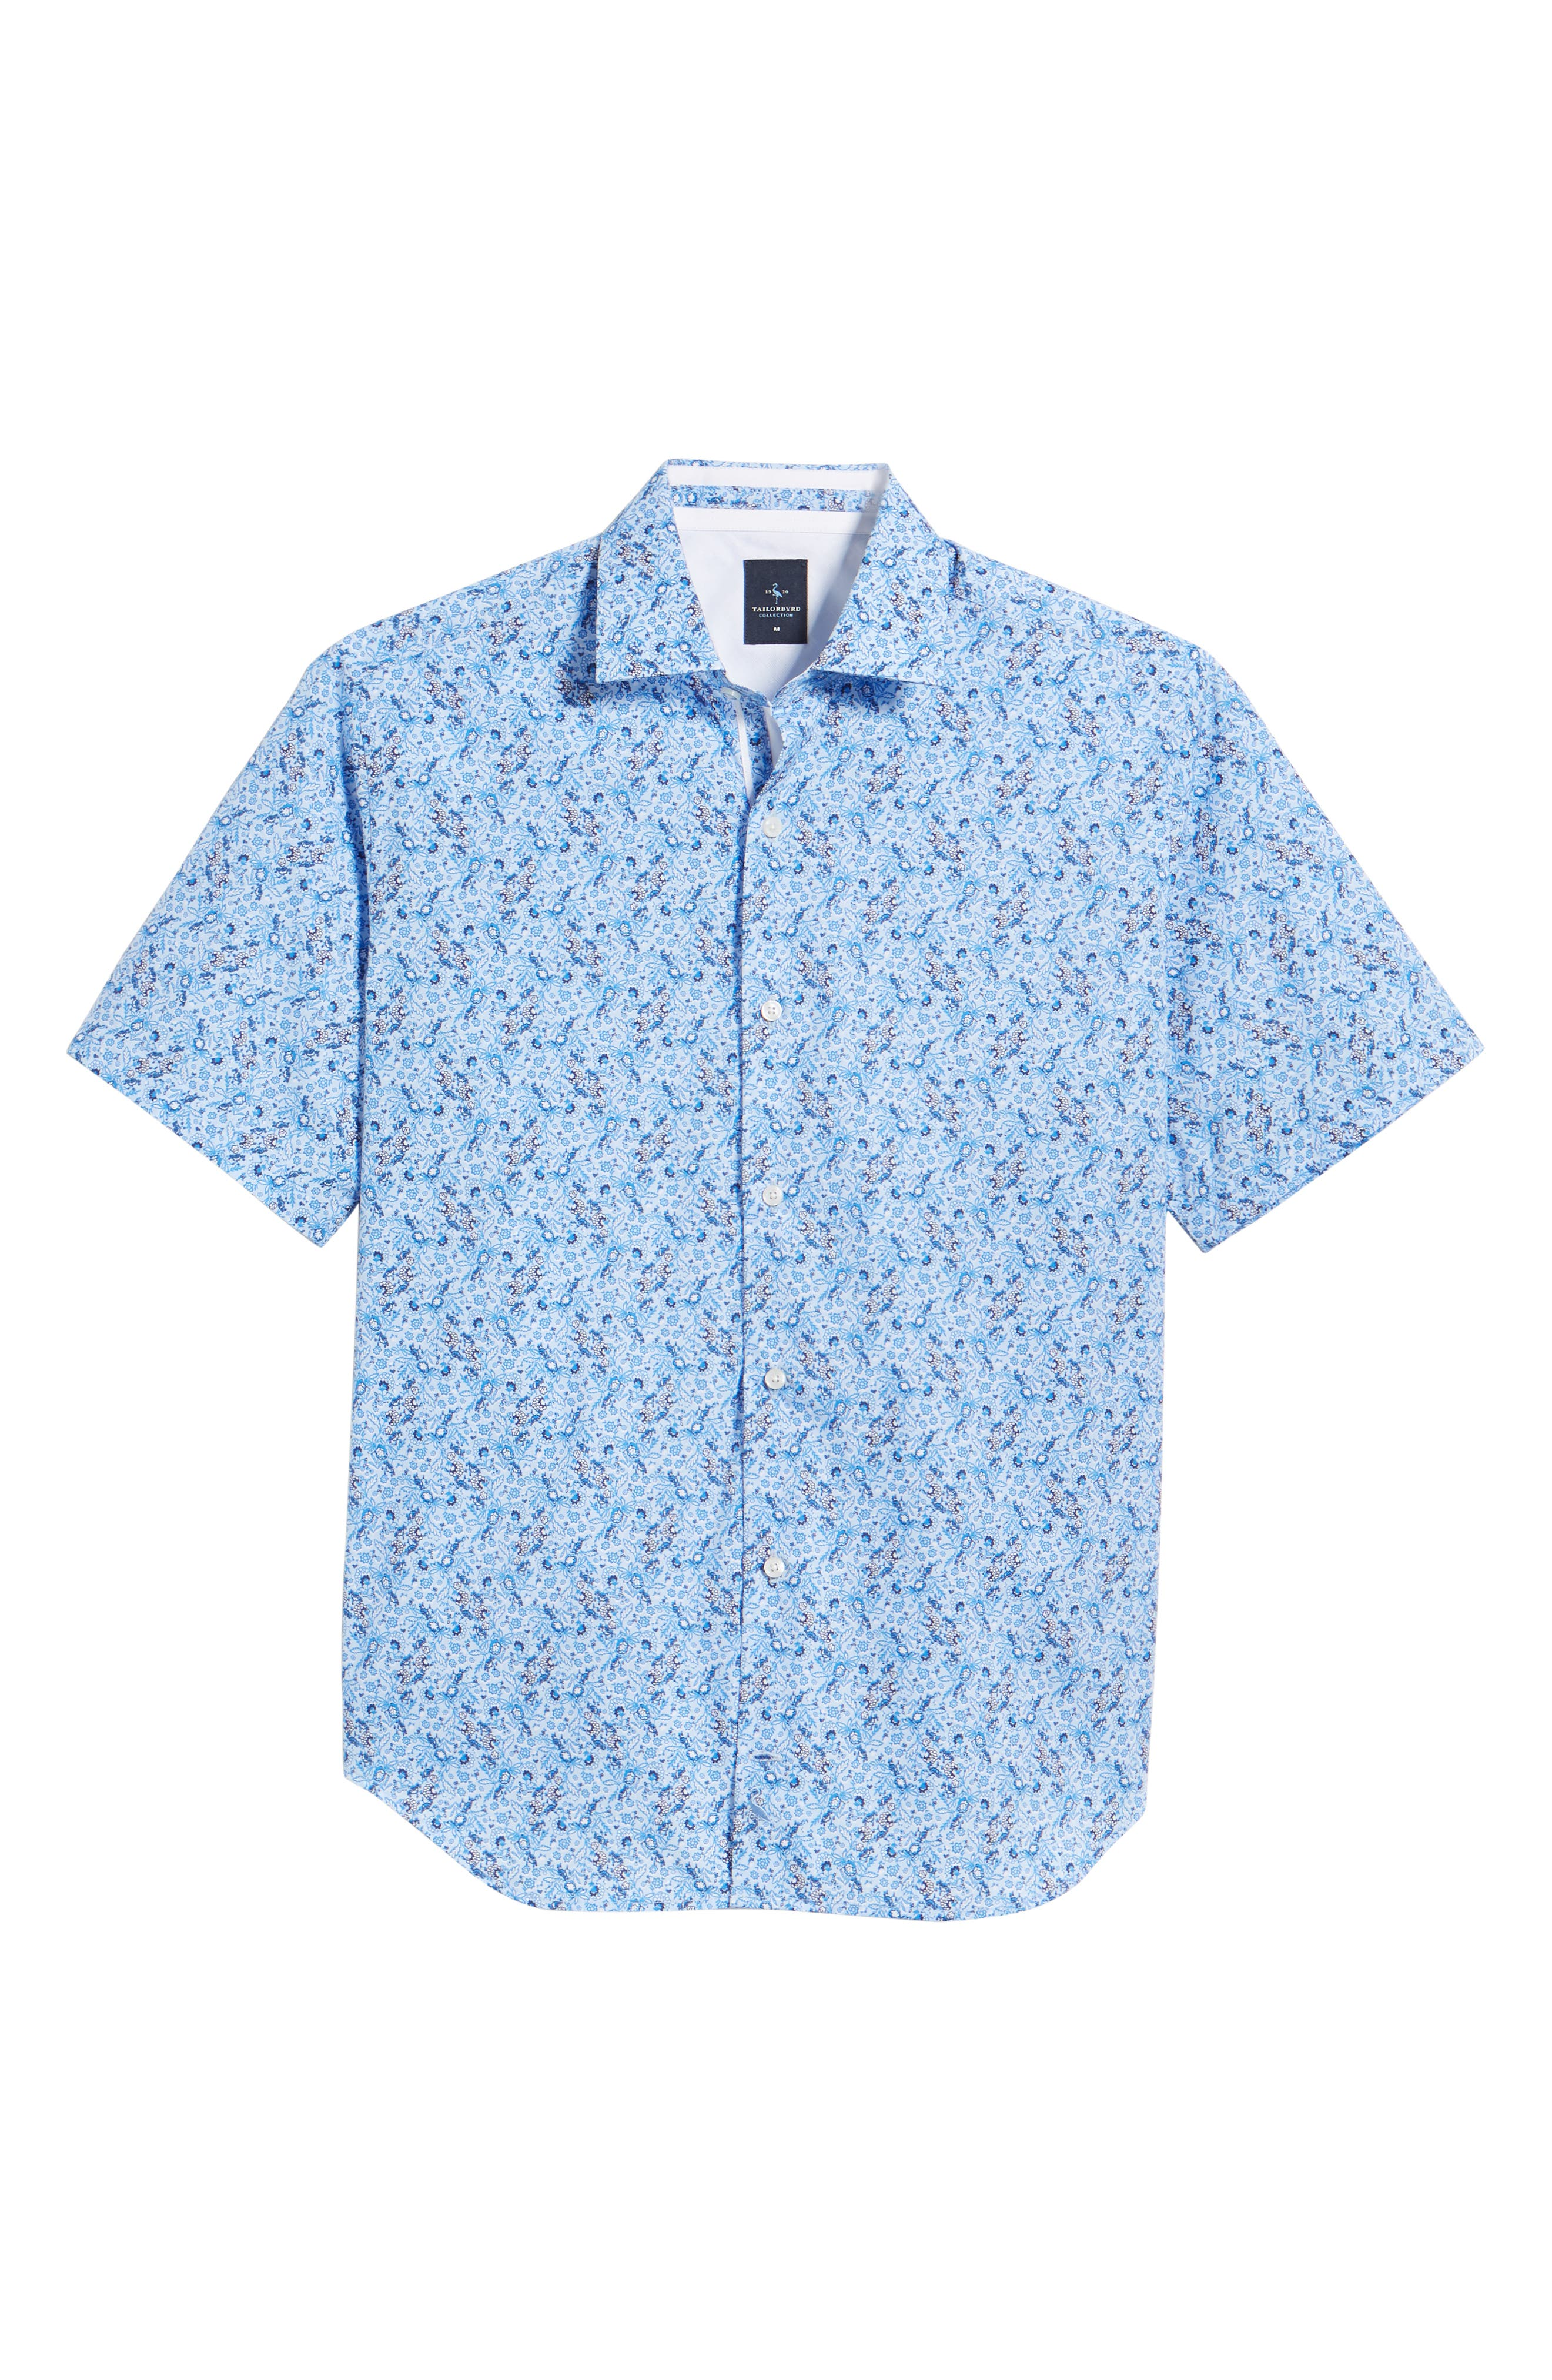 Alaric Regular Fit Print Sport Shirt,                             Alternate thumbnail 6, color,                             Blue